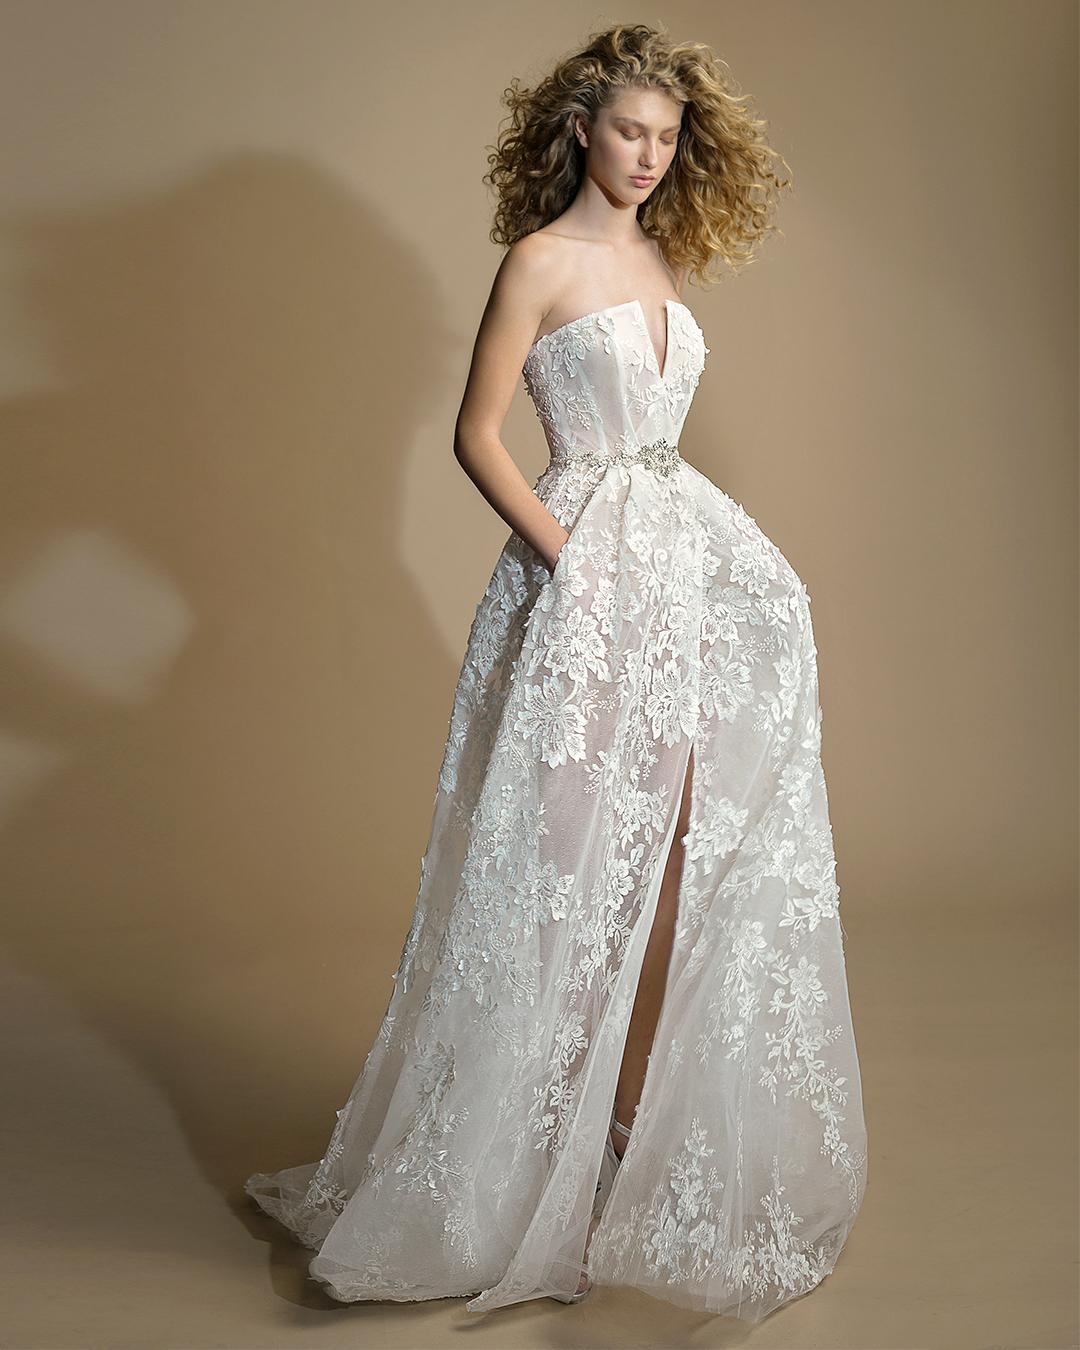 galia lahav gala wedding dress spring 2019 strapless lace ball gown